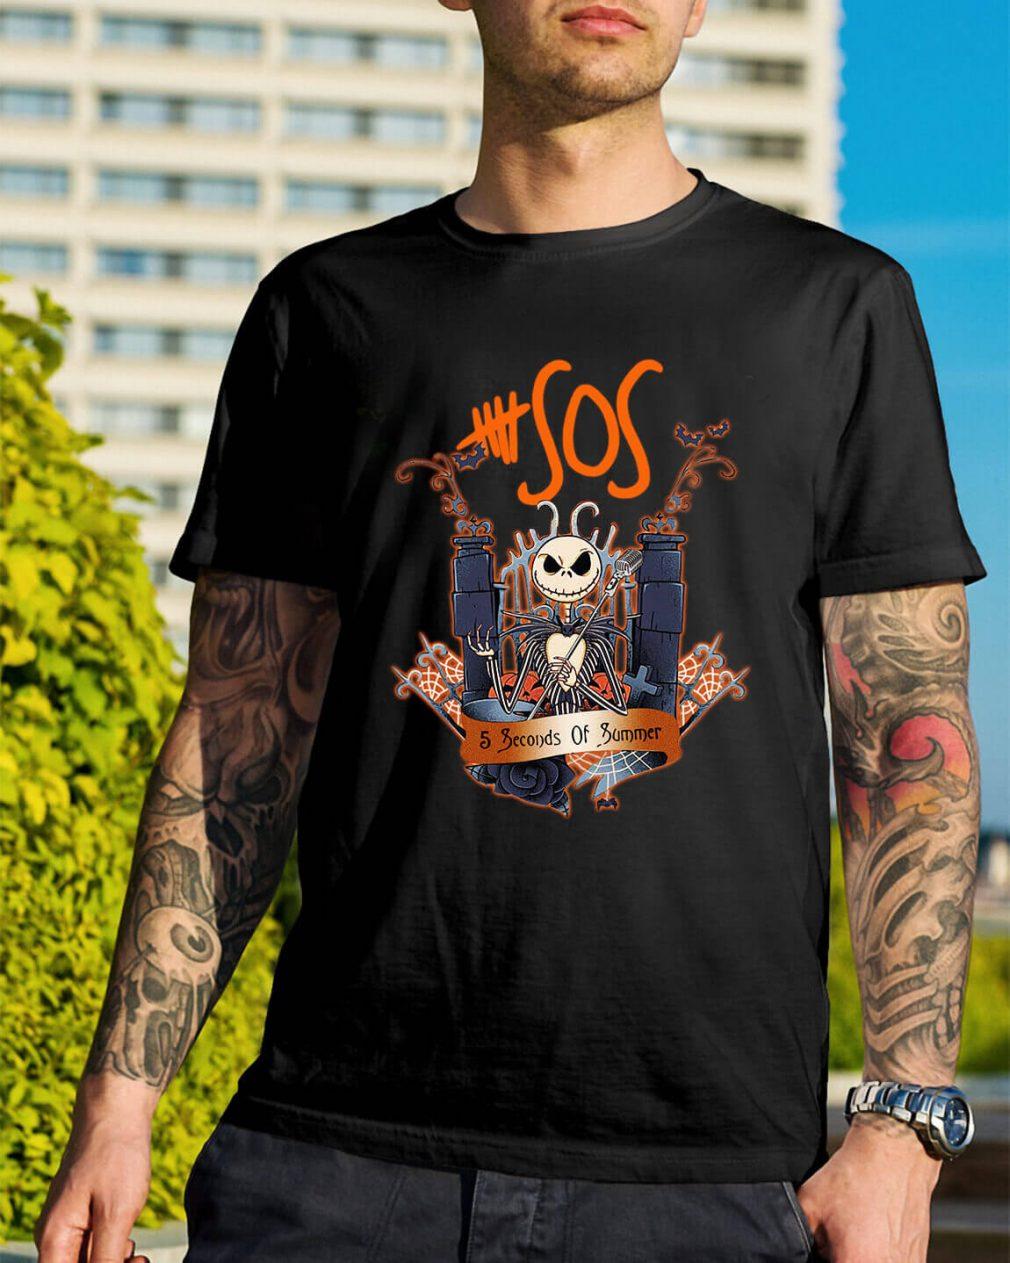 Halloween Jack Skellington 5 seconds of summer shirt